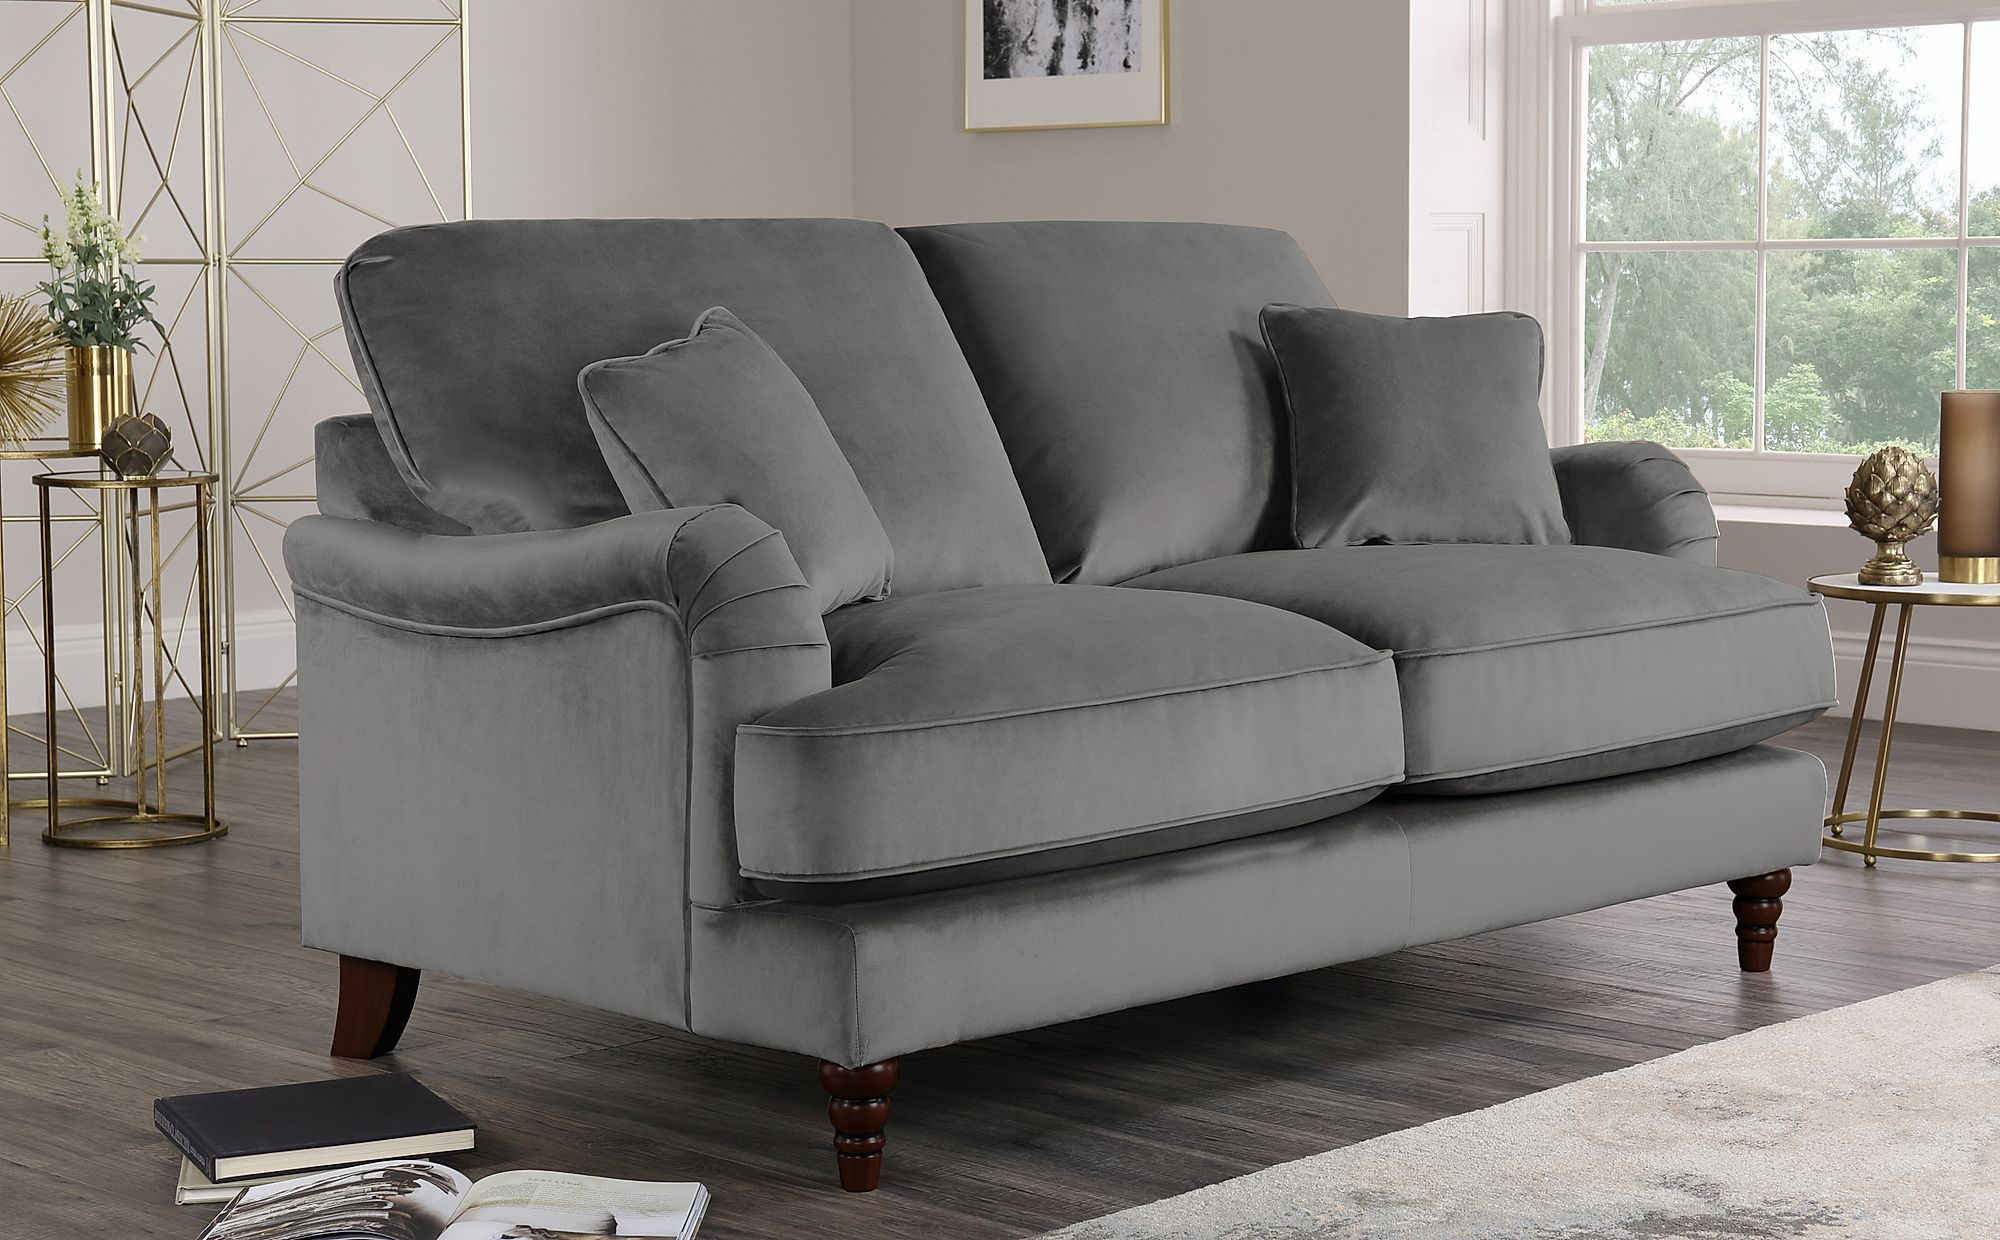 Charleston Grey Velvet Sofa 2 Seater Only £649.99 | Furniture Choice